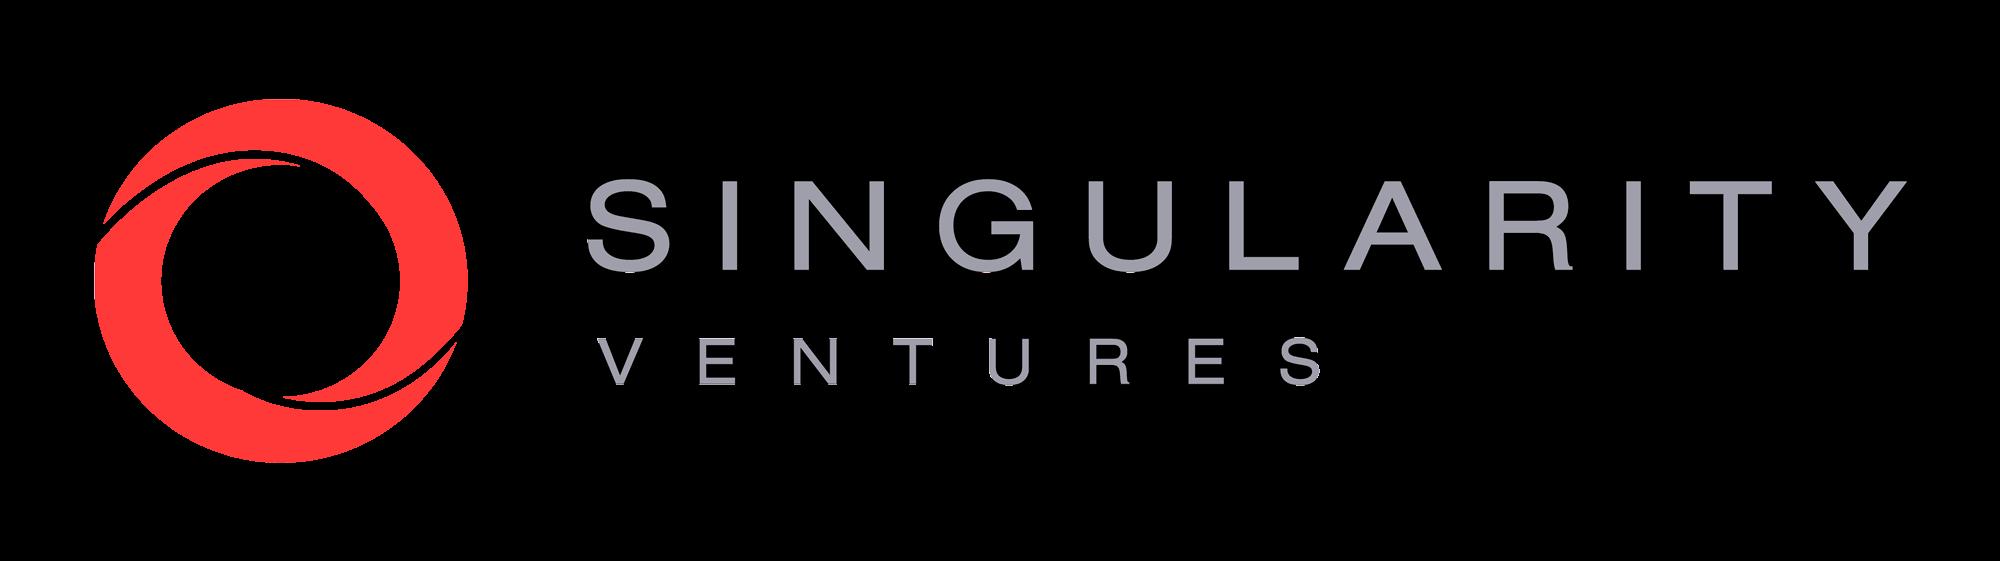 singularity ventures